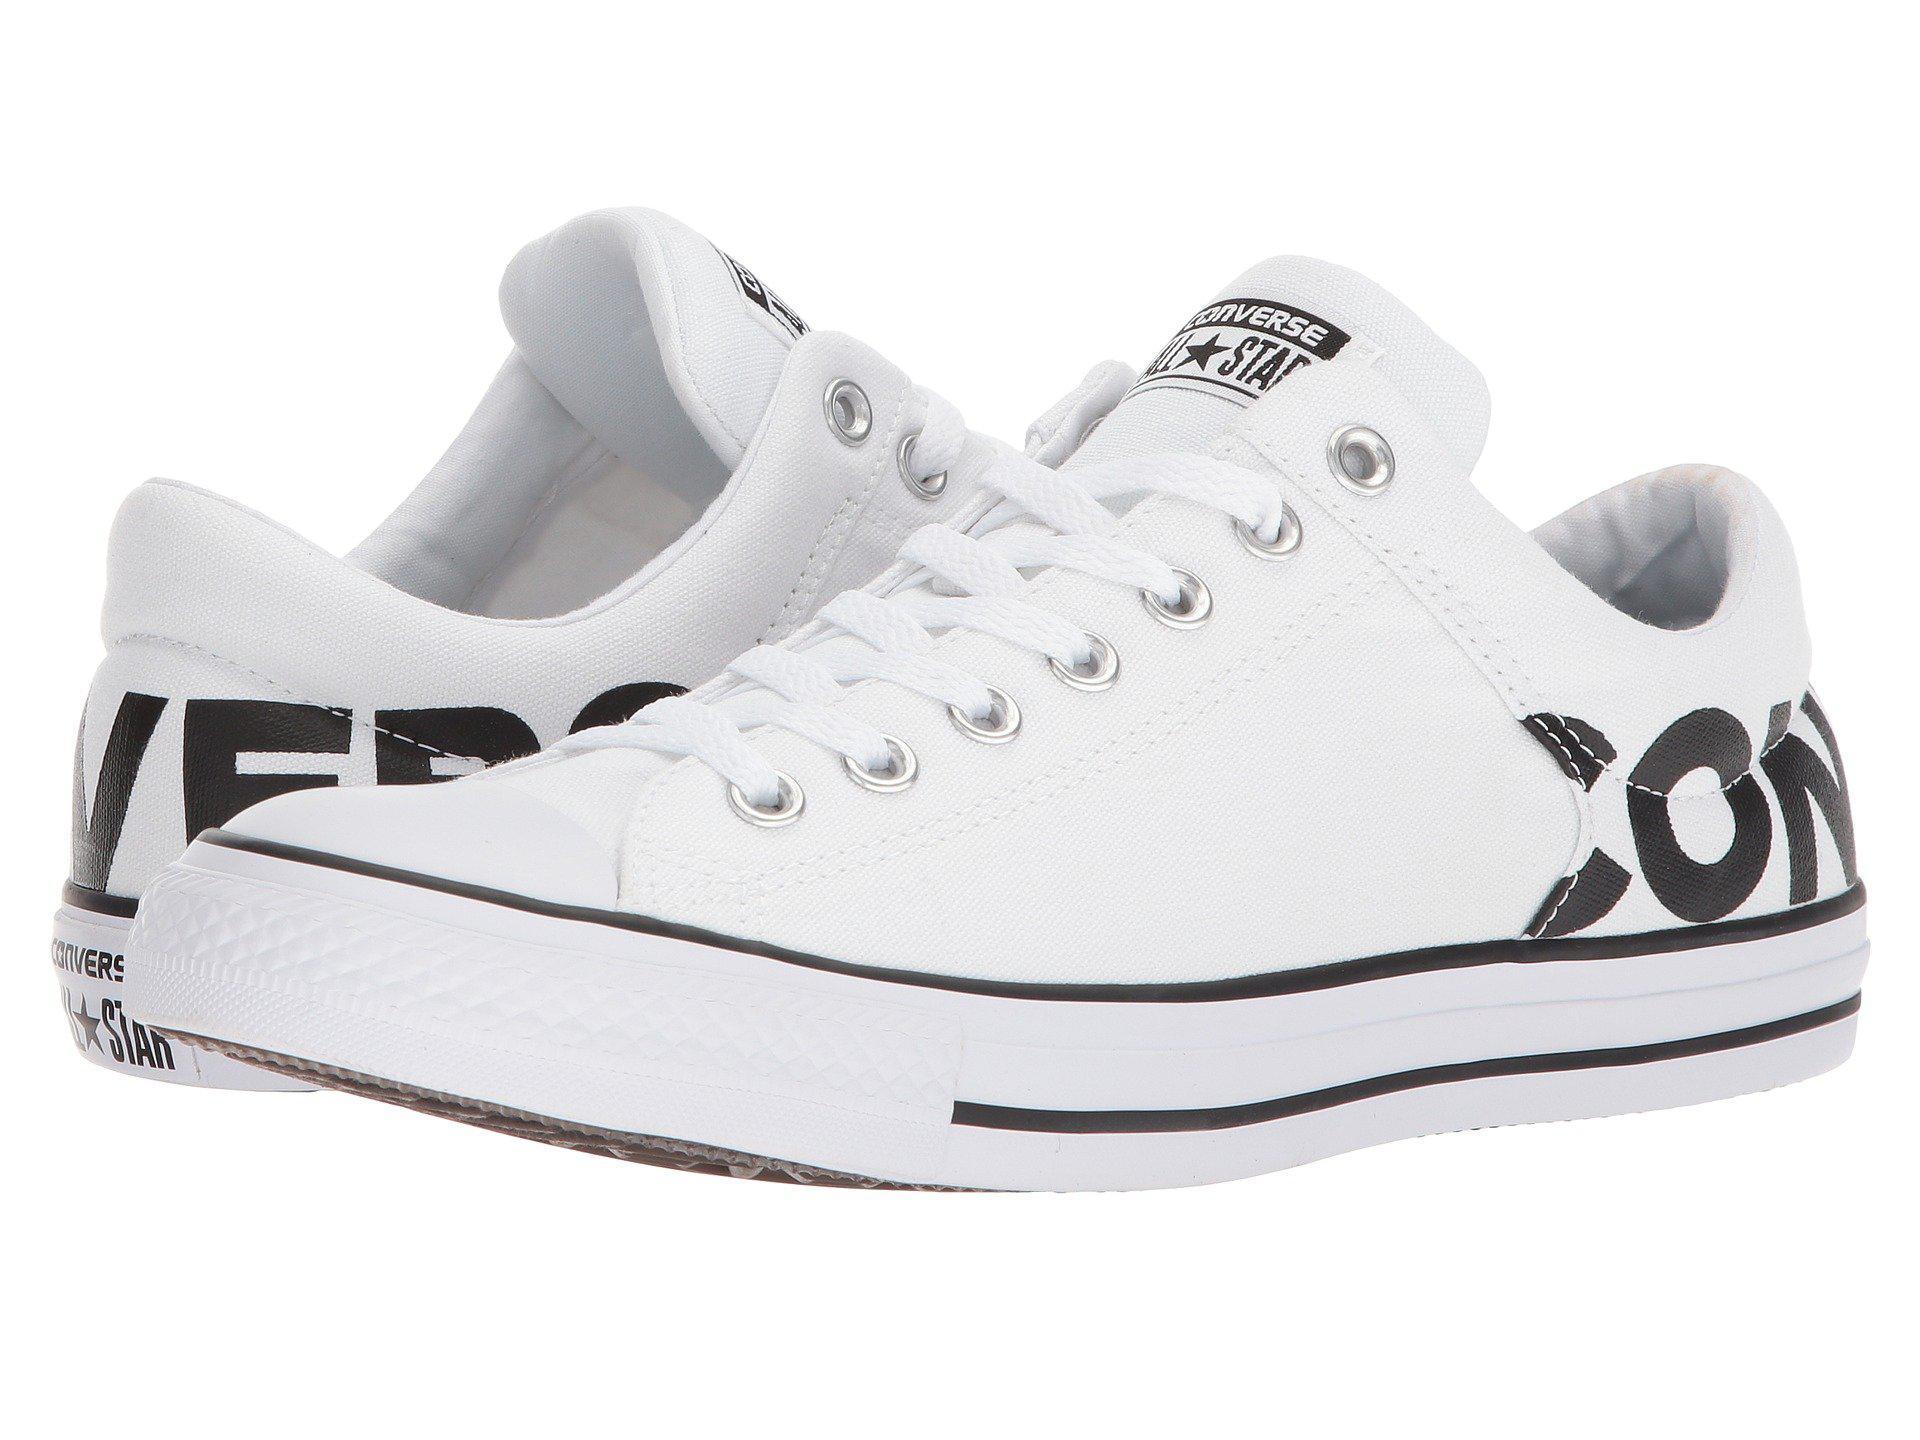 840c551adfacd3 Lyst - Converse Chuck Taylor® All Star® High Street Wordmark Ox in ...